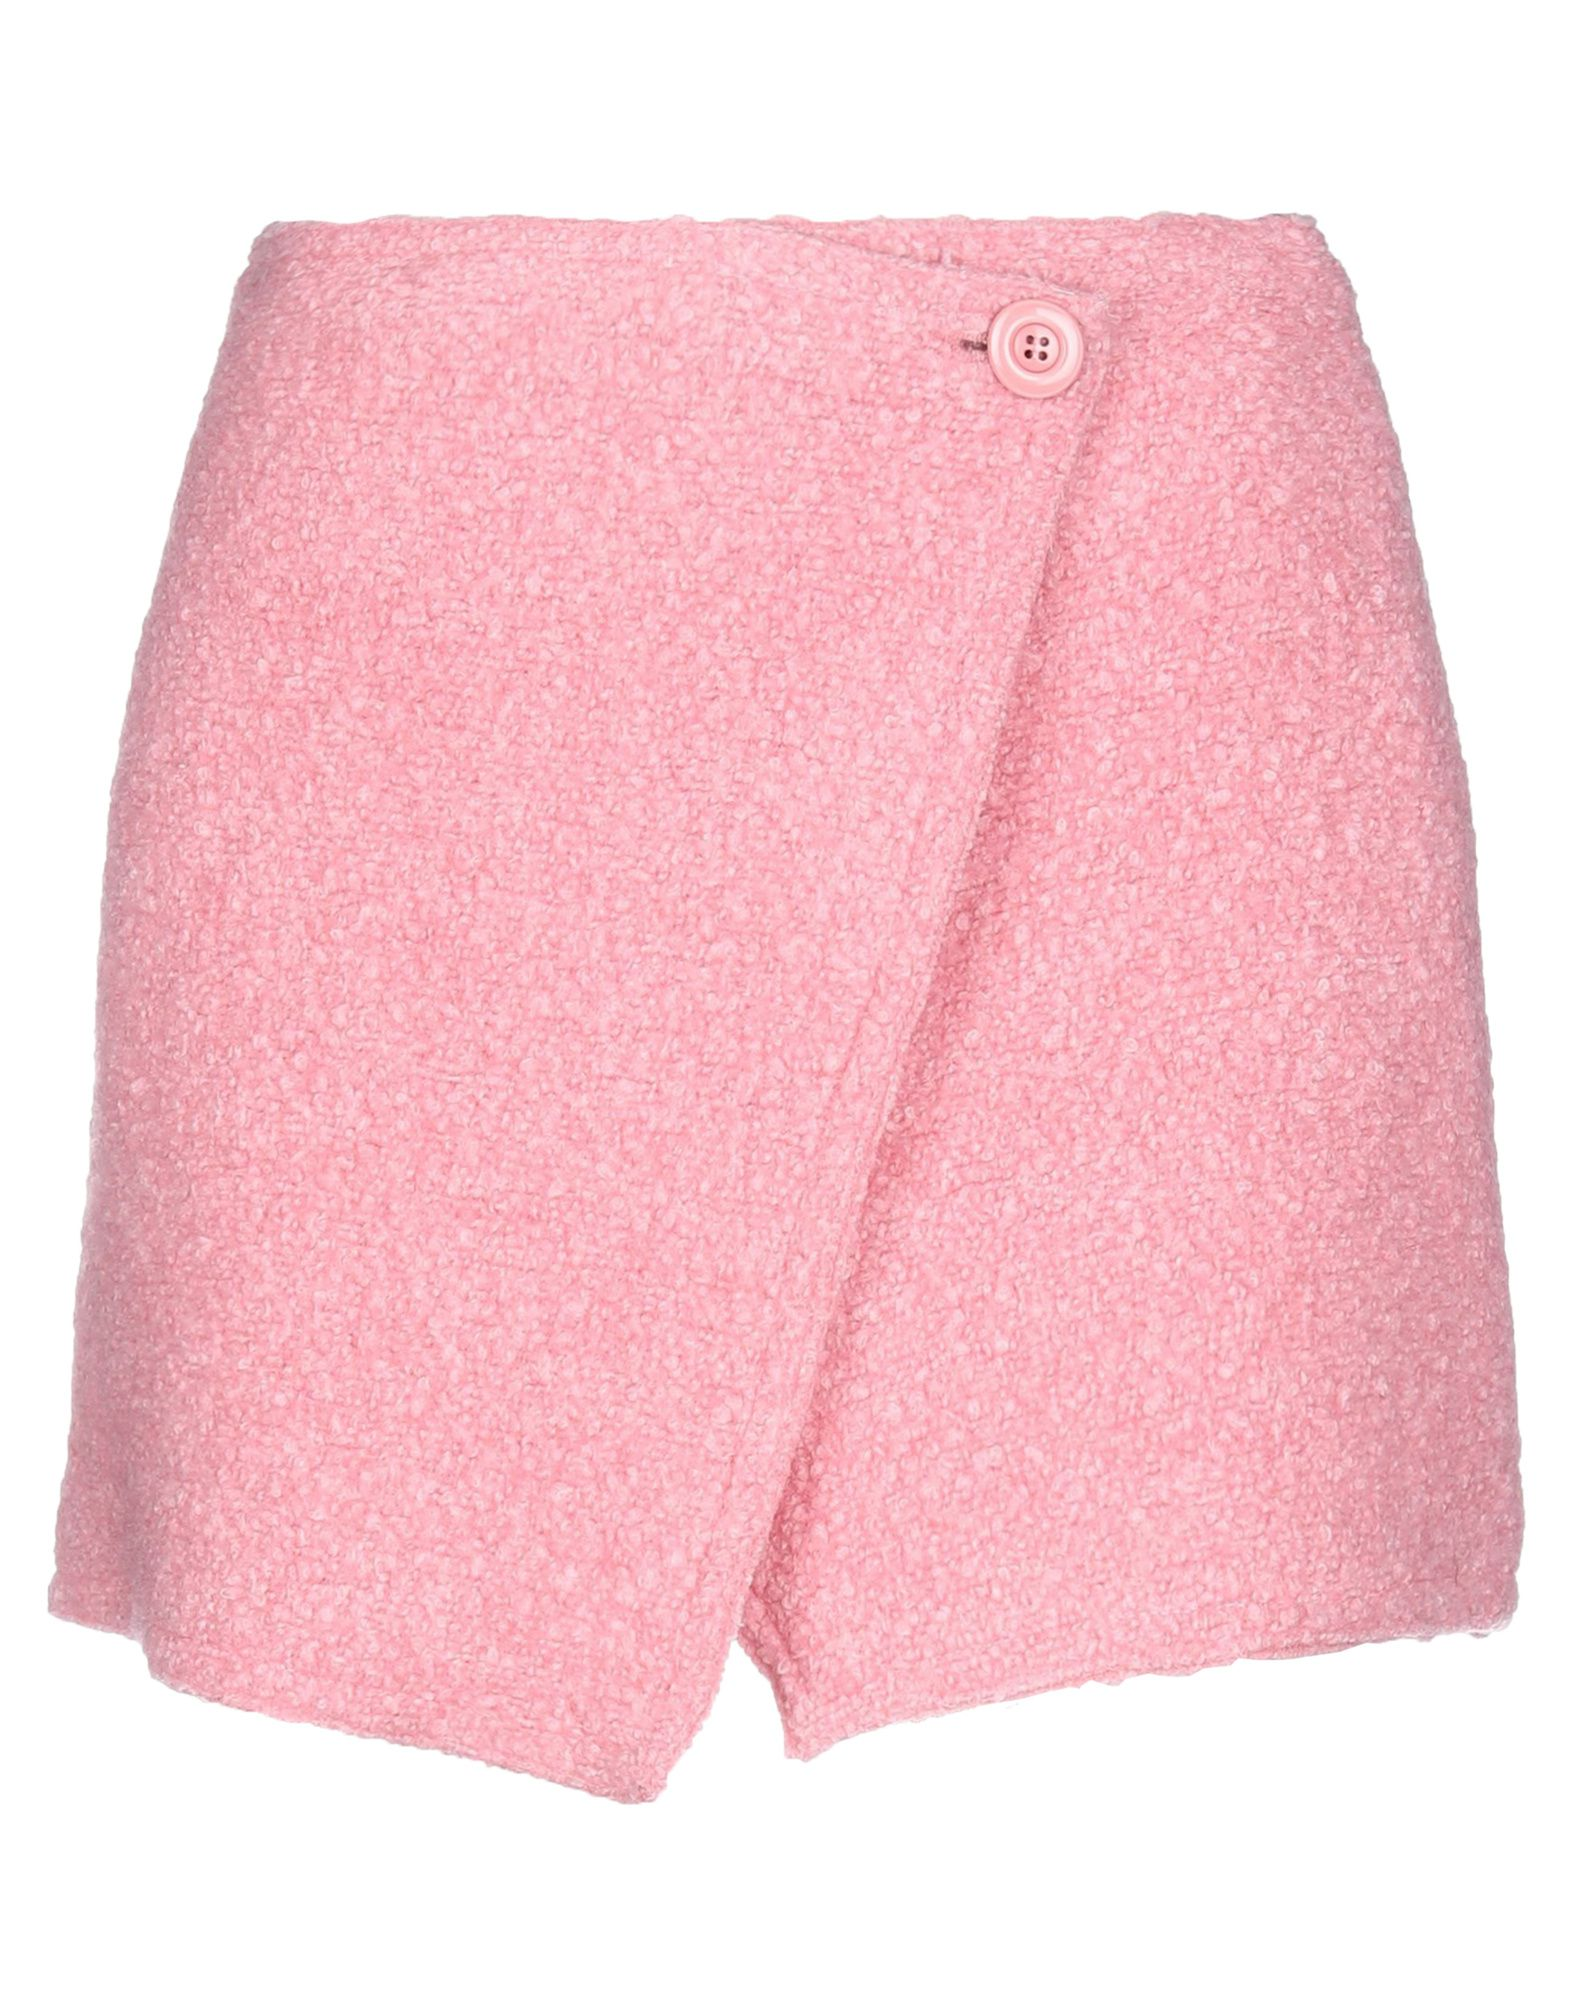 ERMANNO DI ERMANNO SCERVINO Мини-юбка полуприлегающая юбка с застежкой на пуговицы ermanno scervino